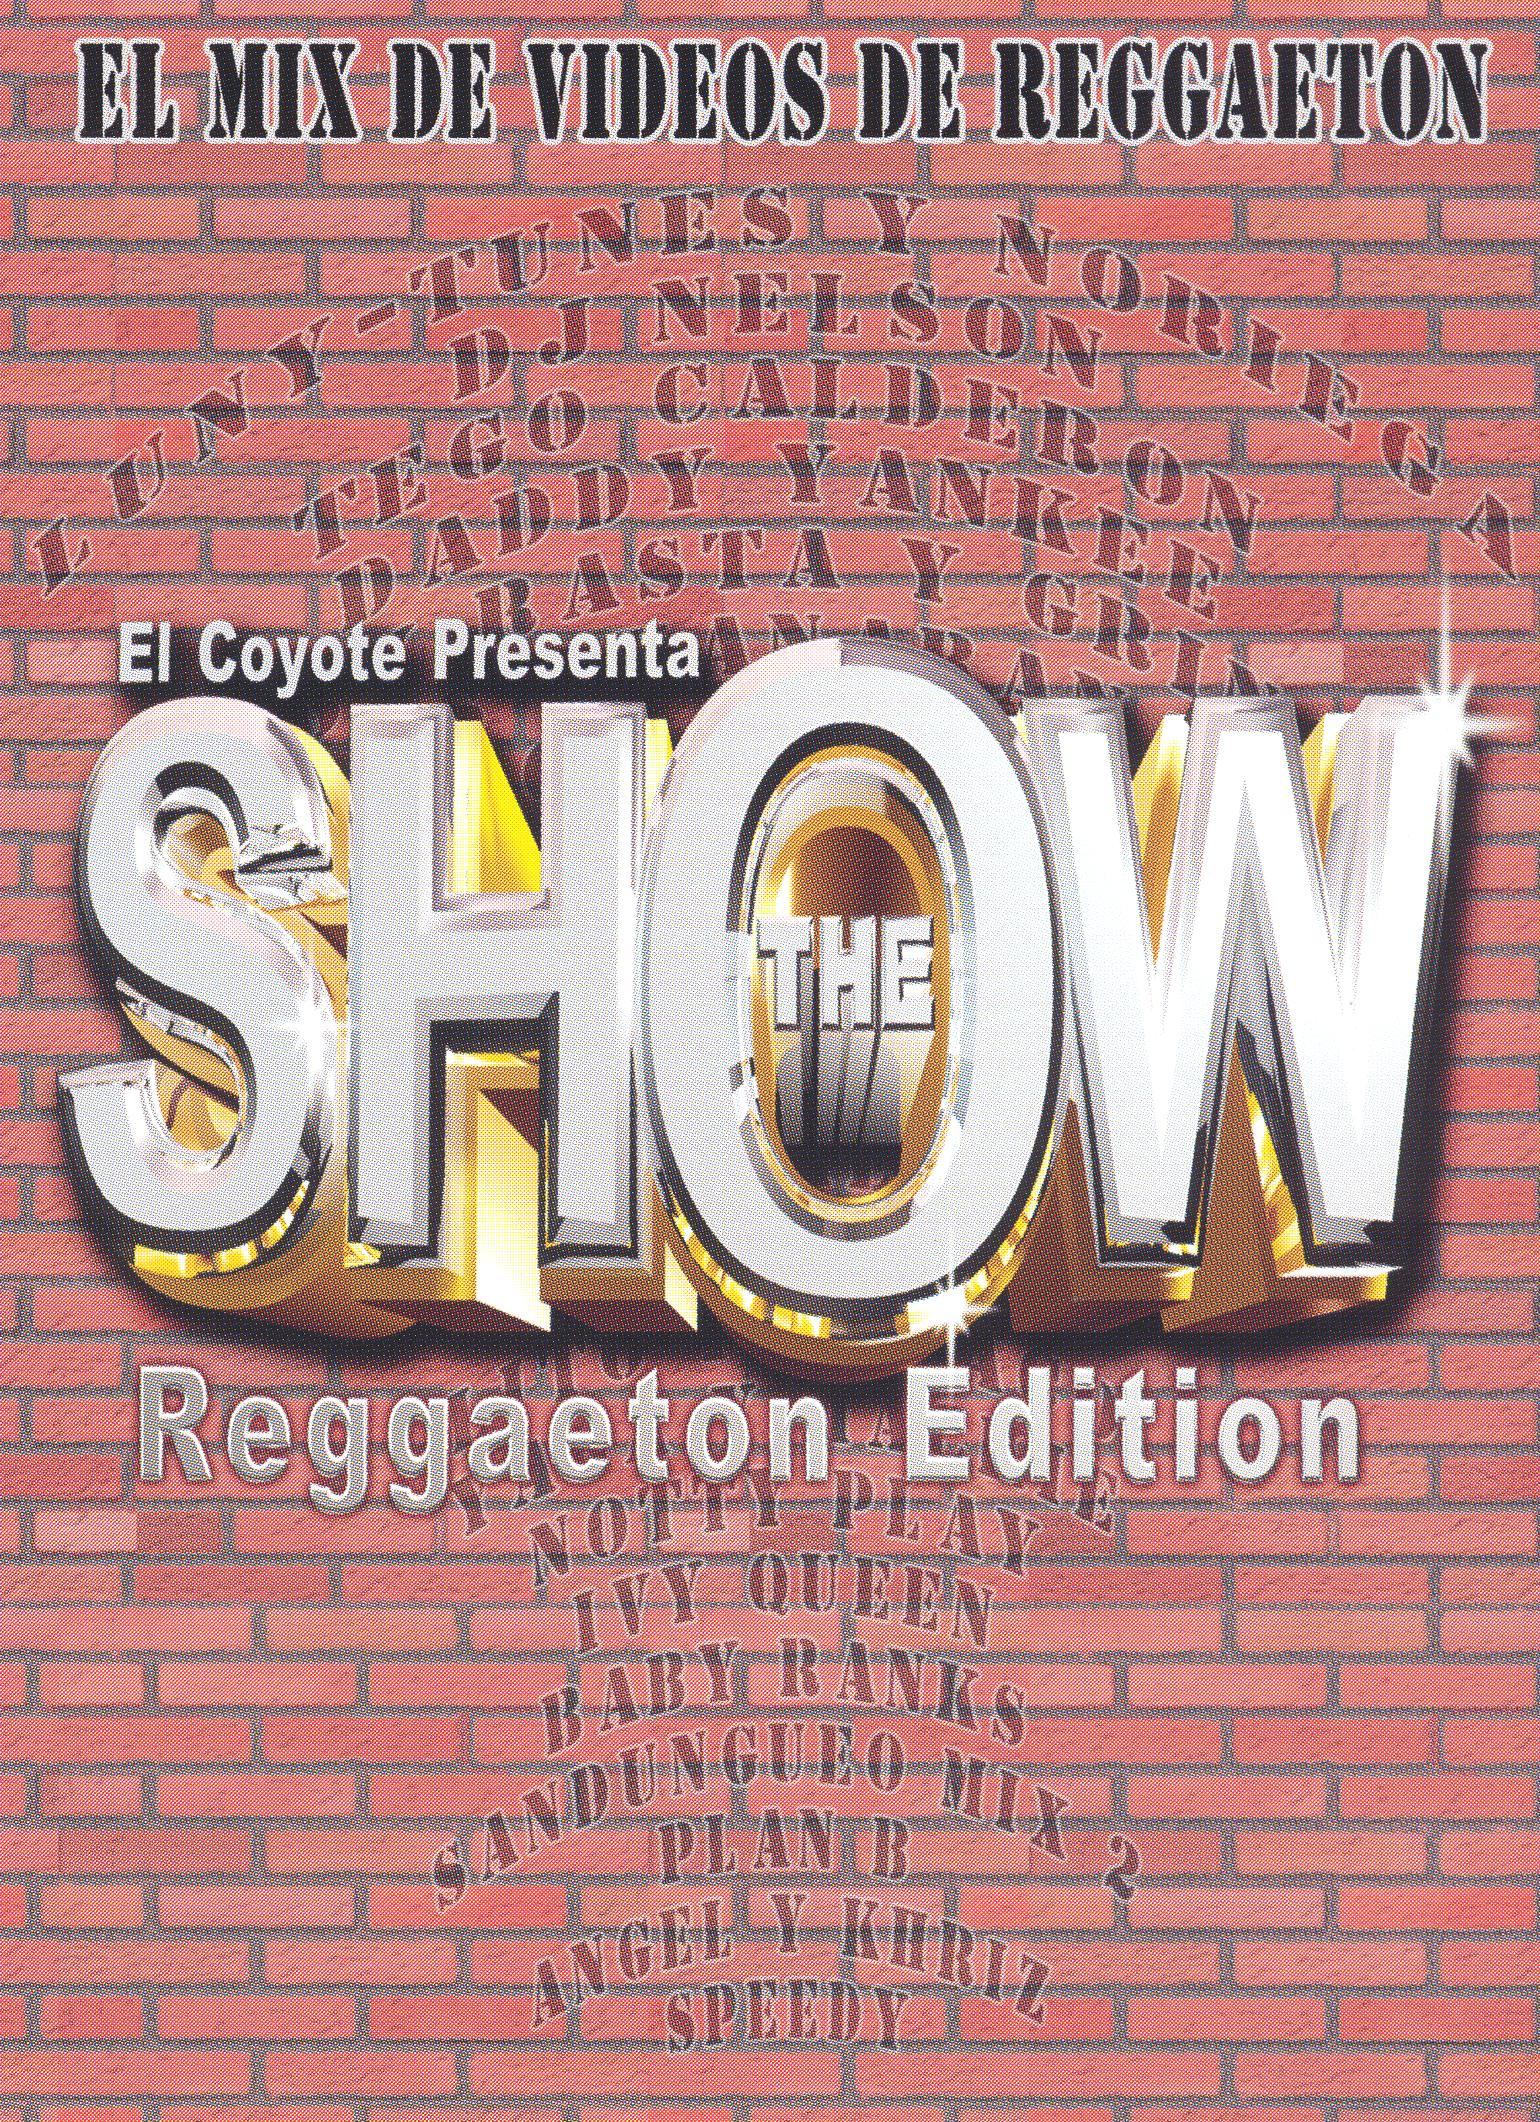 The Show: Reggaeton Edition